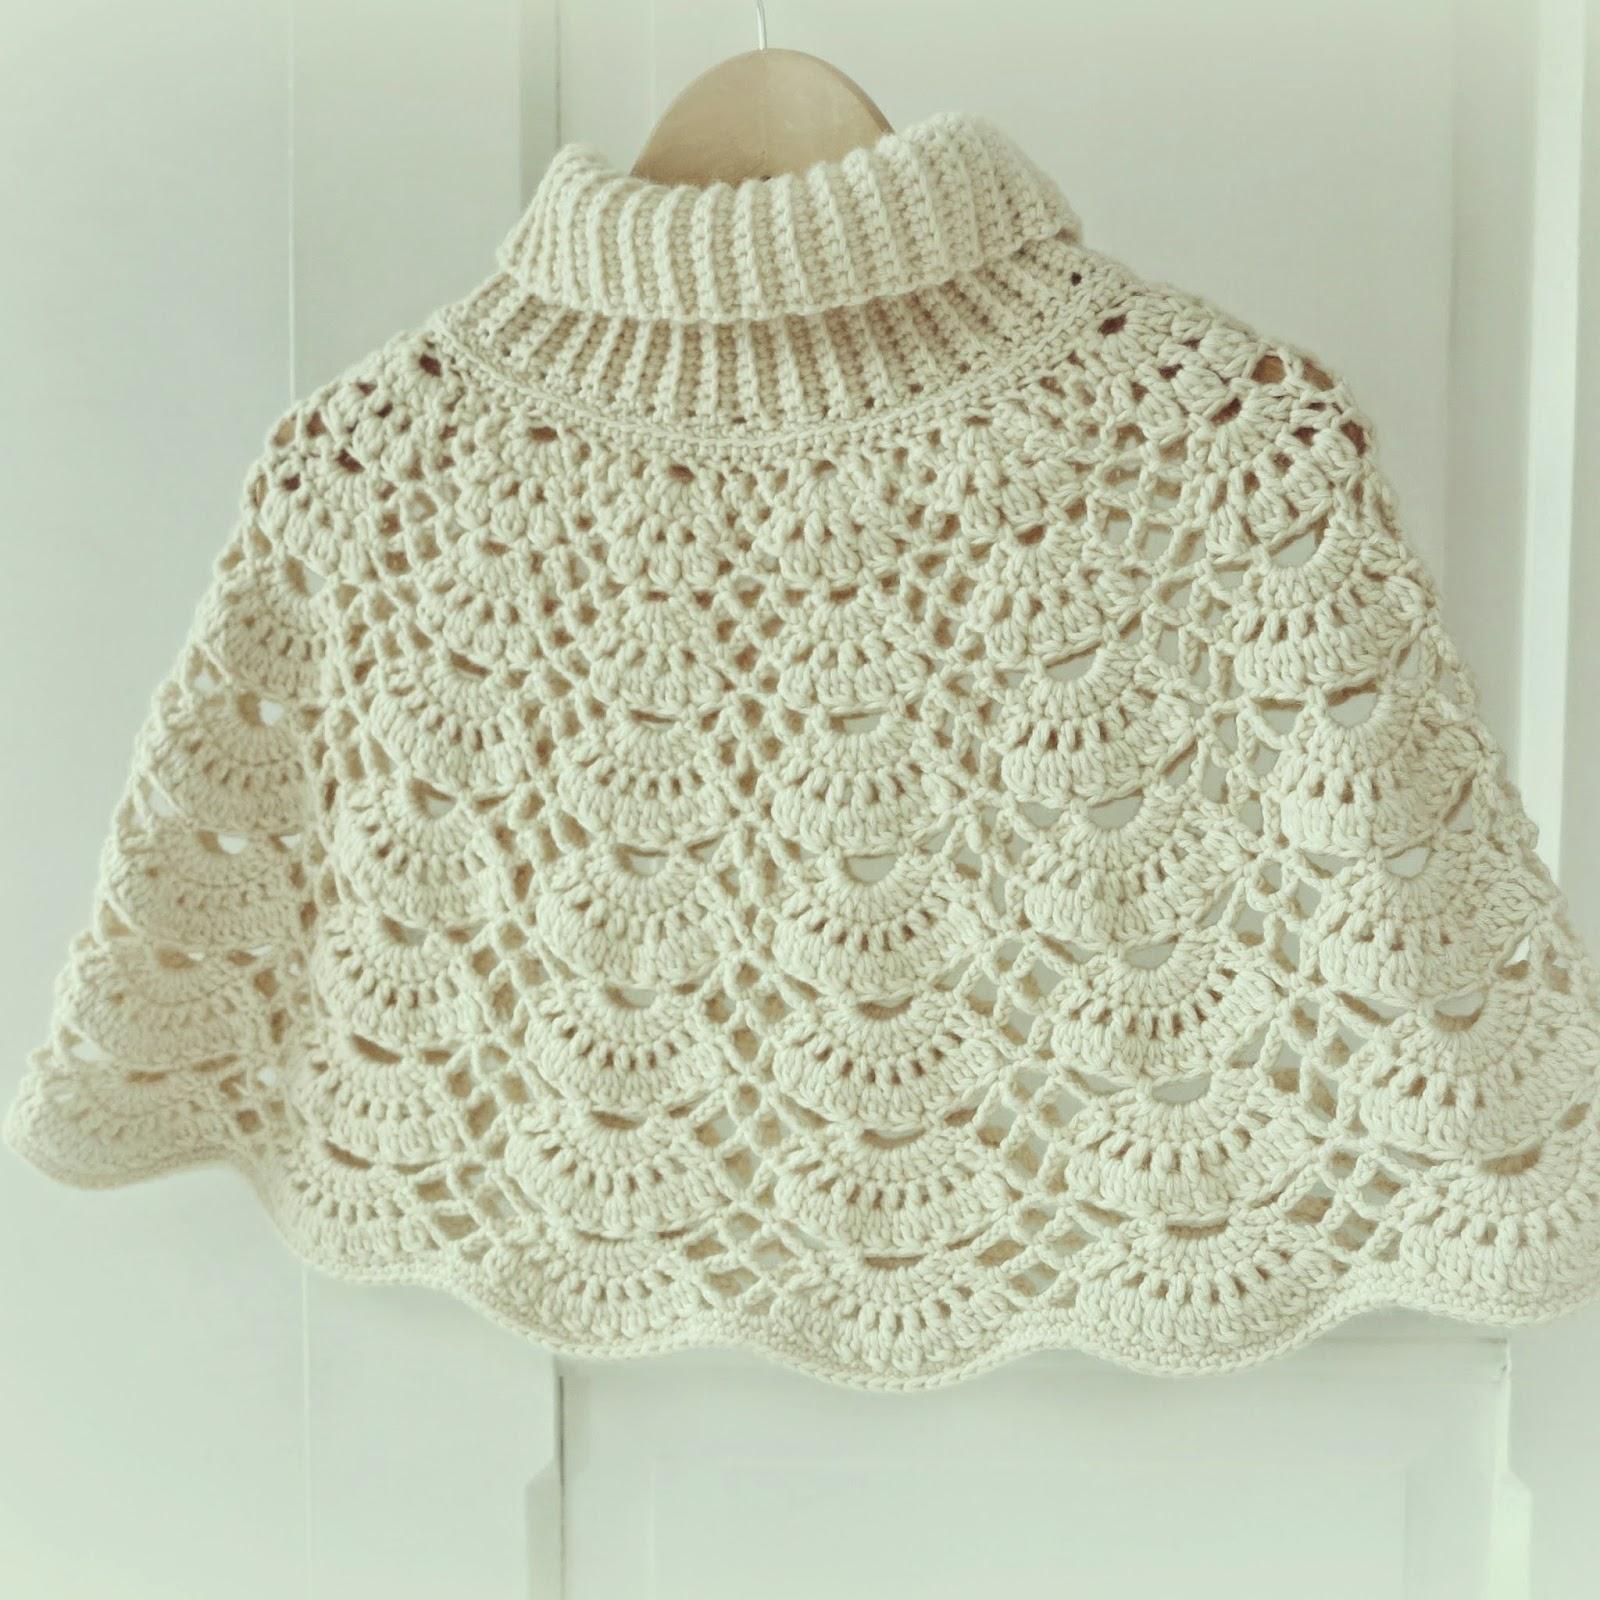 ByHaafner * crochet : Crochet Cape